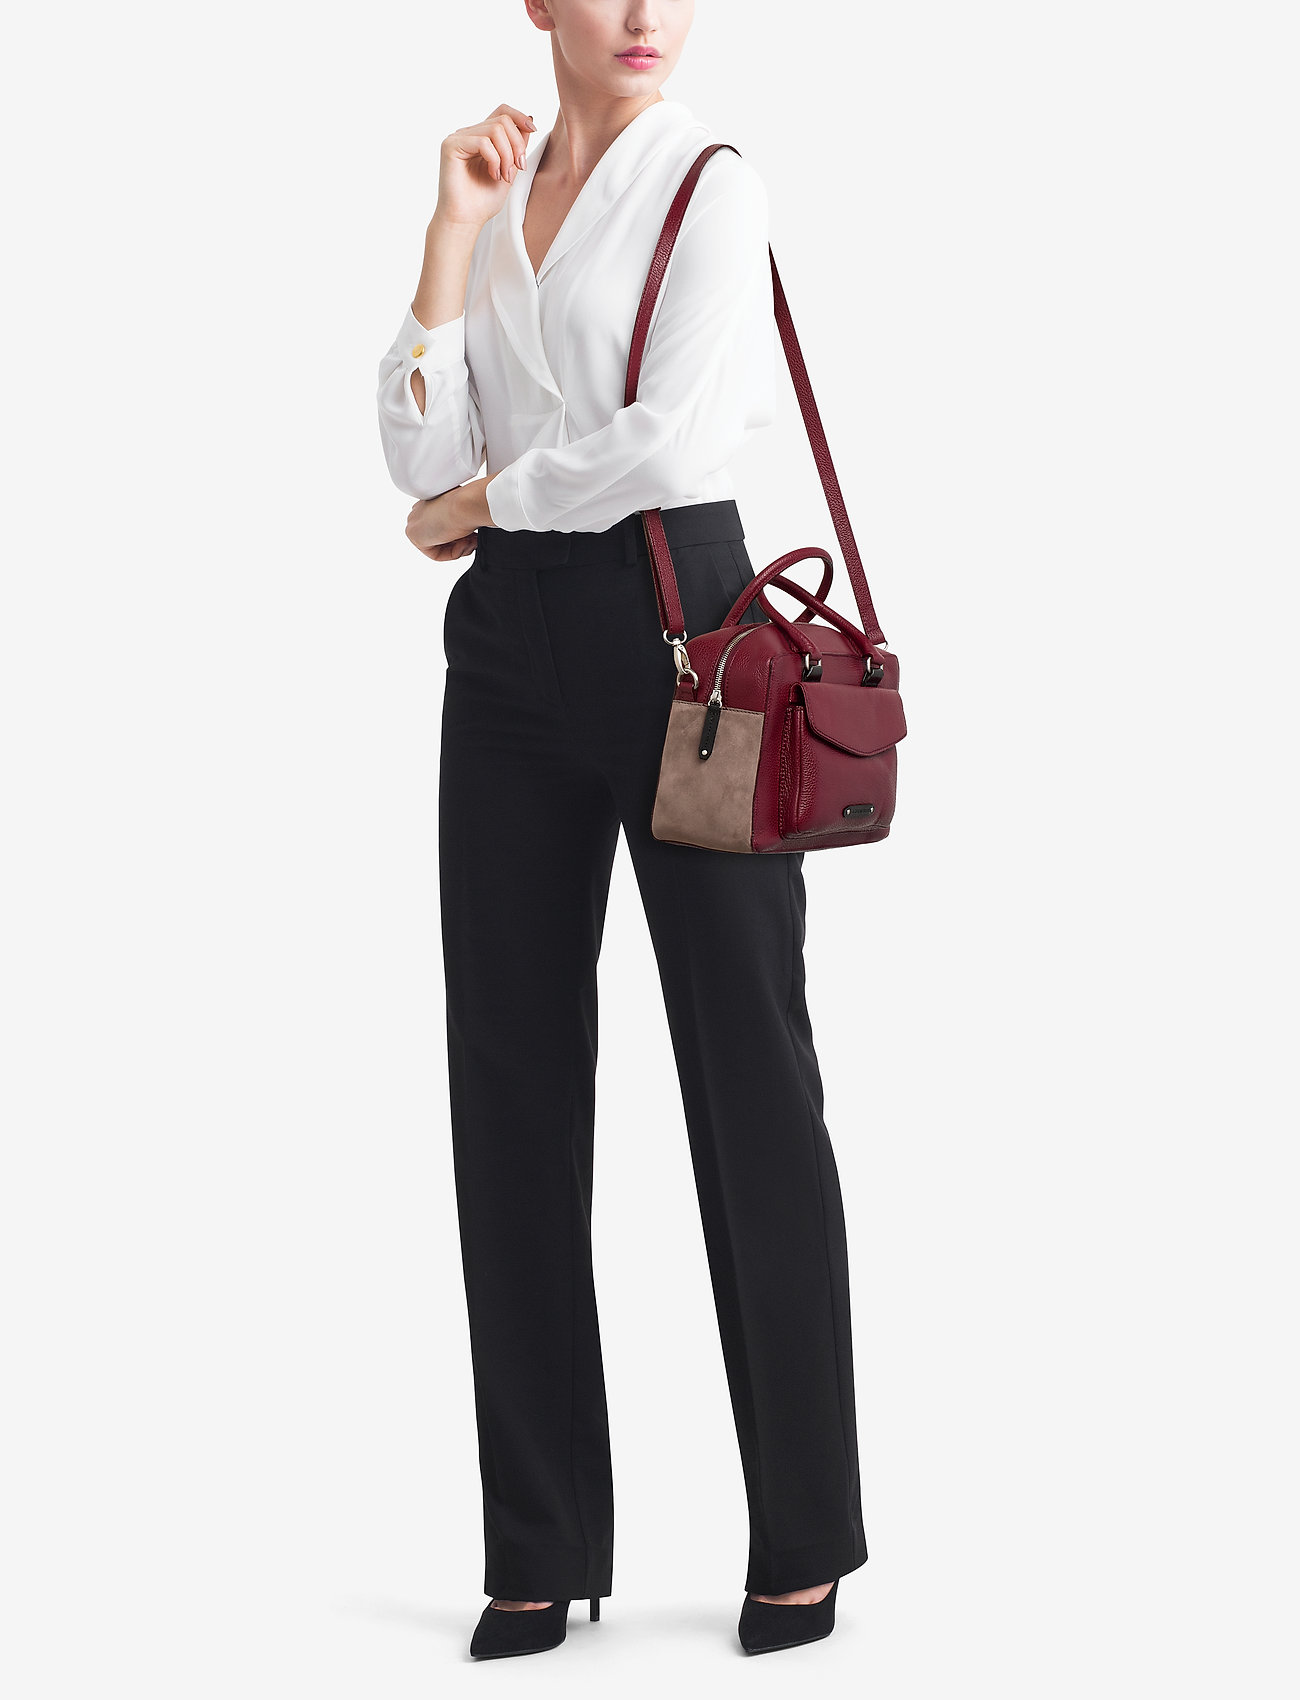 GiGi Fratelli Handbag - RUBINO/SUEDE